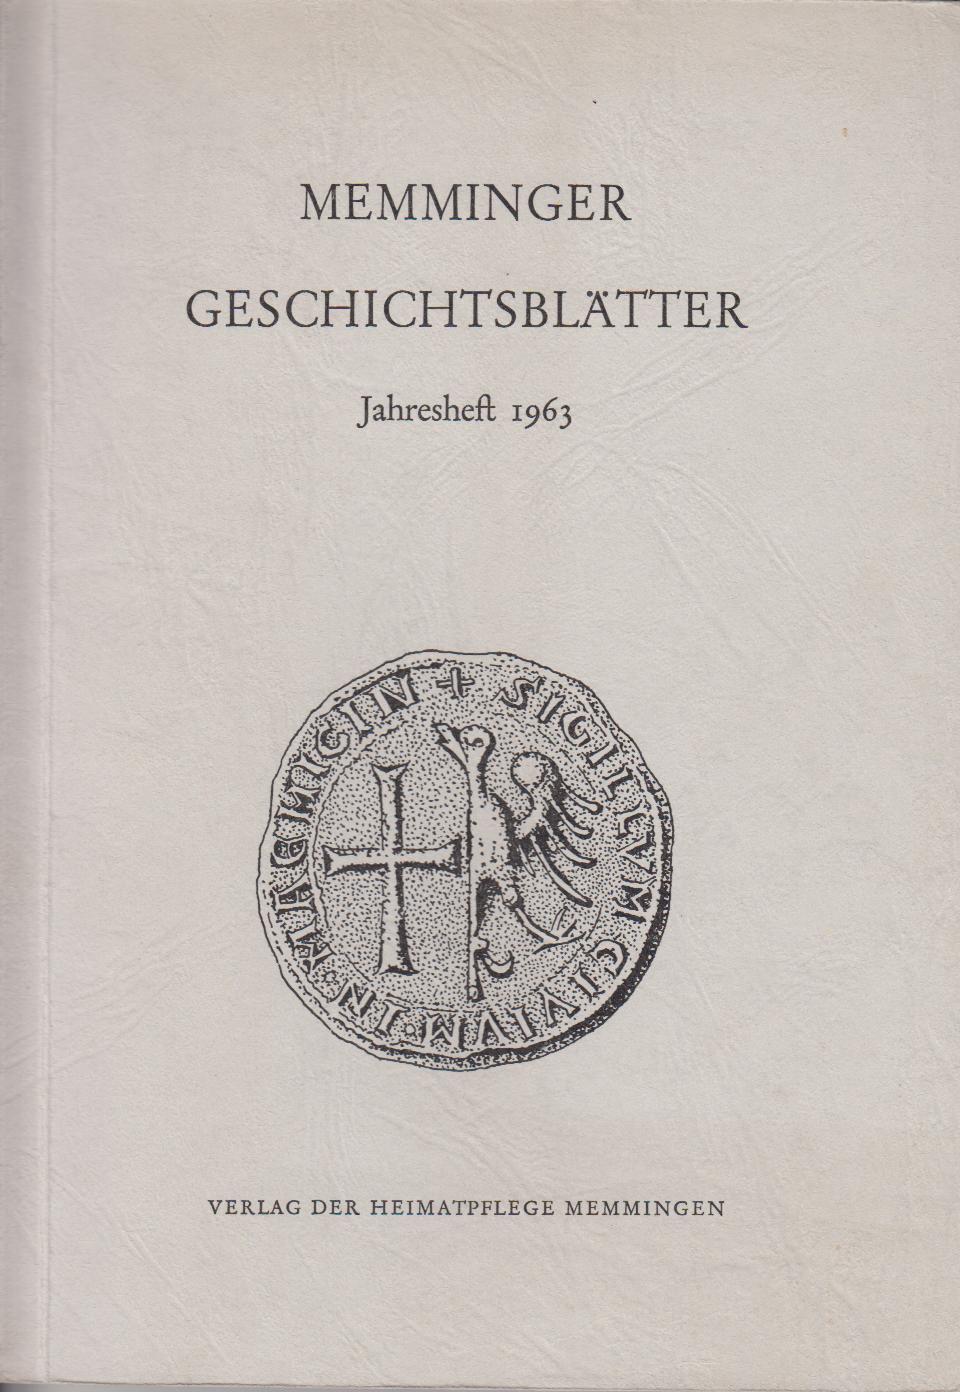 Memminger Geschichtsblätter. Jahresheft 1963.